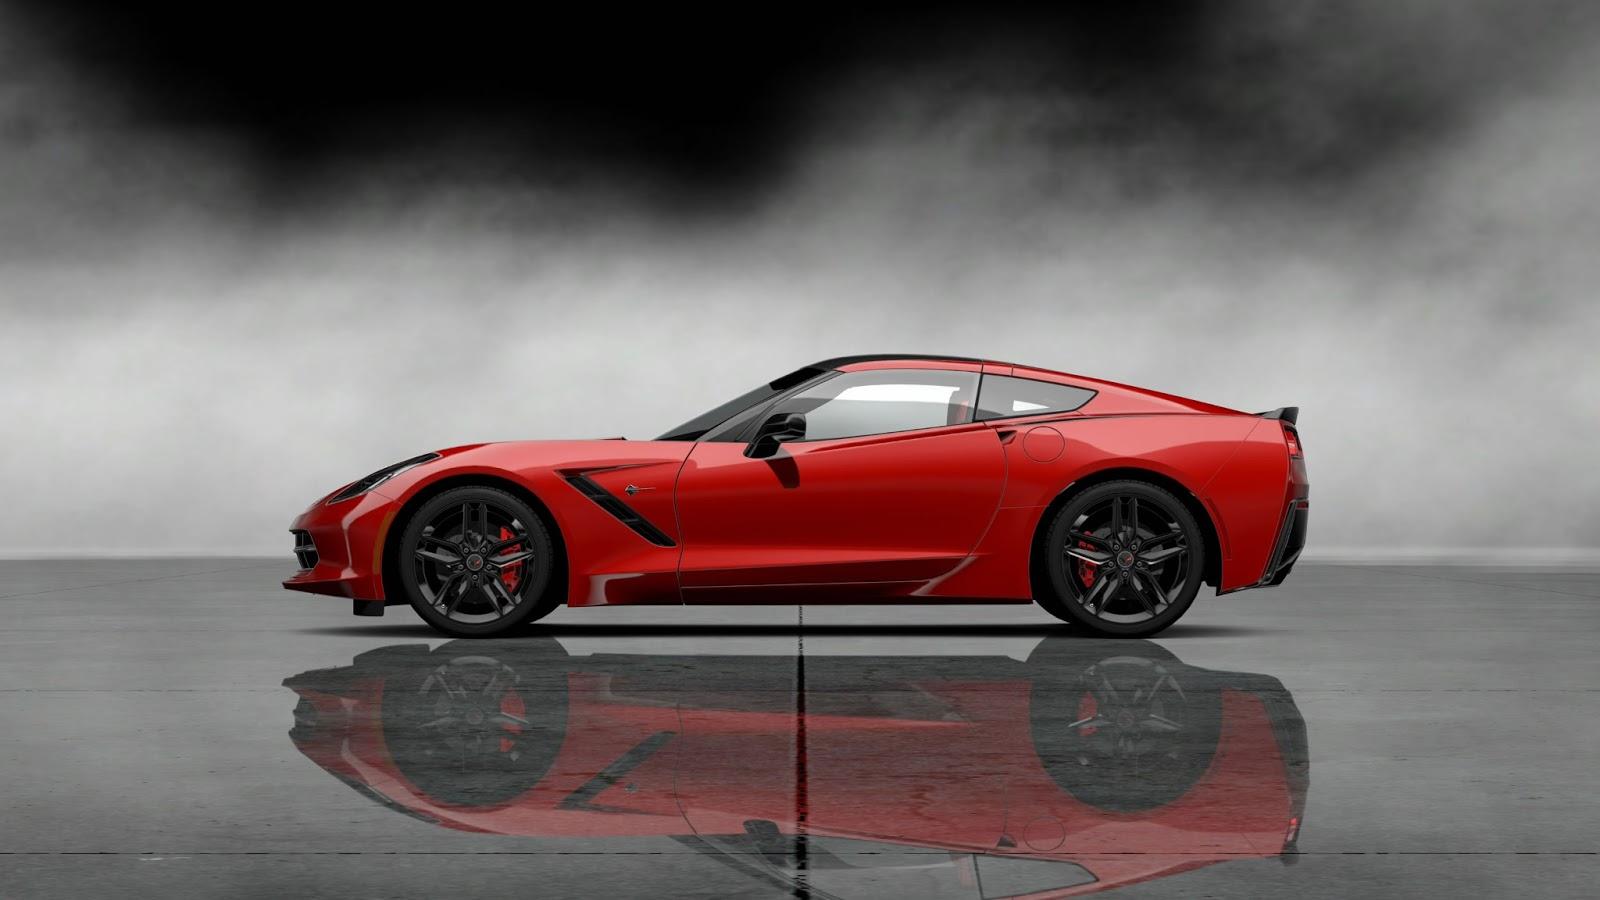 perry auto group 2014 chevrolet corvette stingray most fuel efficient sports car. Black Bedroom Furniture Sets. Home Design Ideas